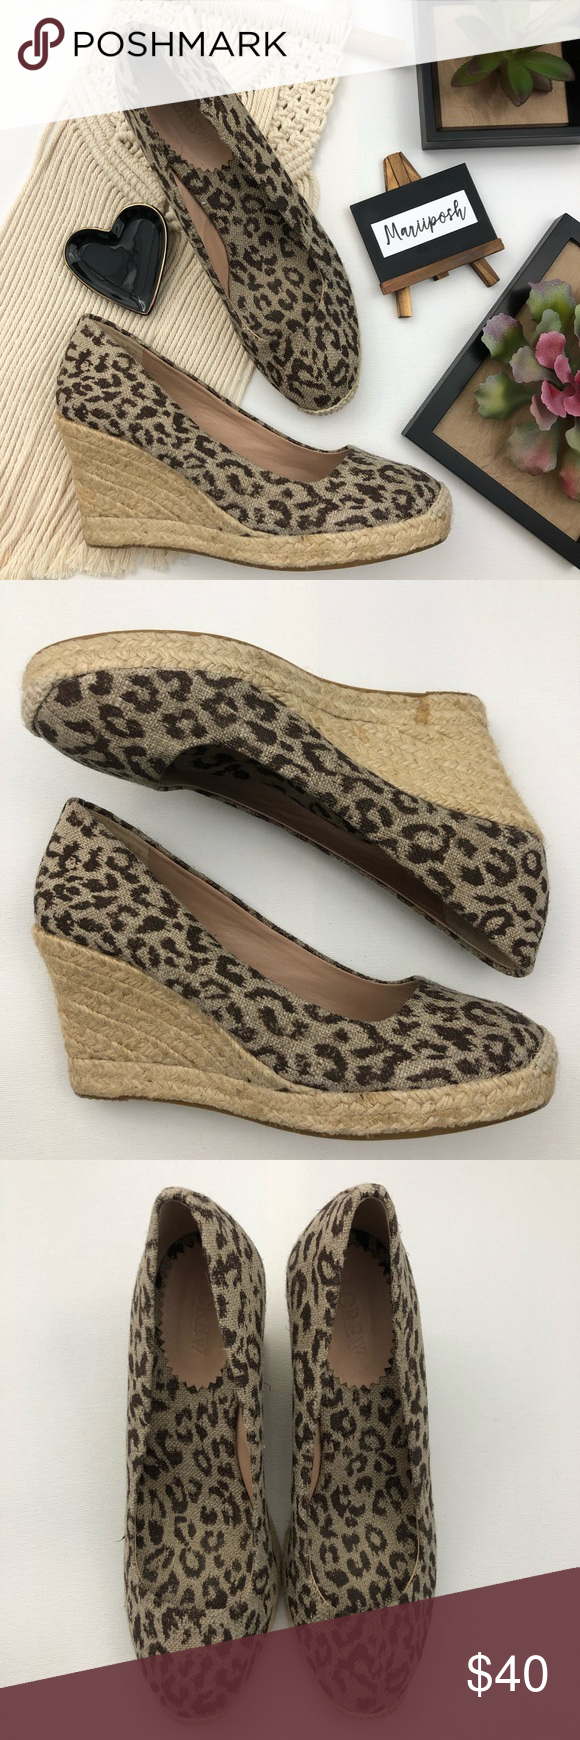 ed8a40fa48f J. CREW Espadrille Animal Print Wedge Shoes -animal print / leopard ...